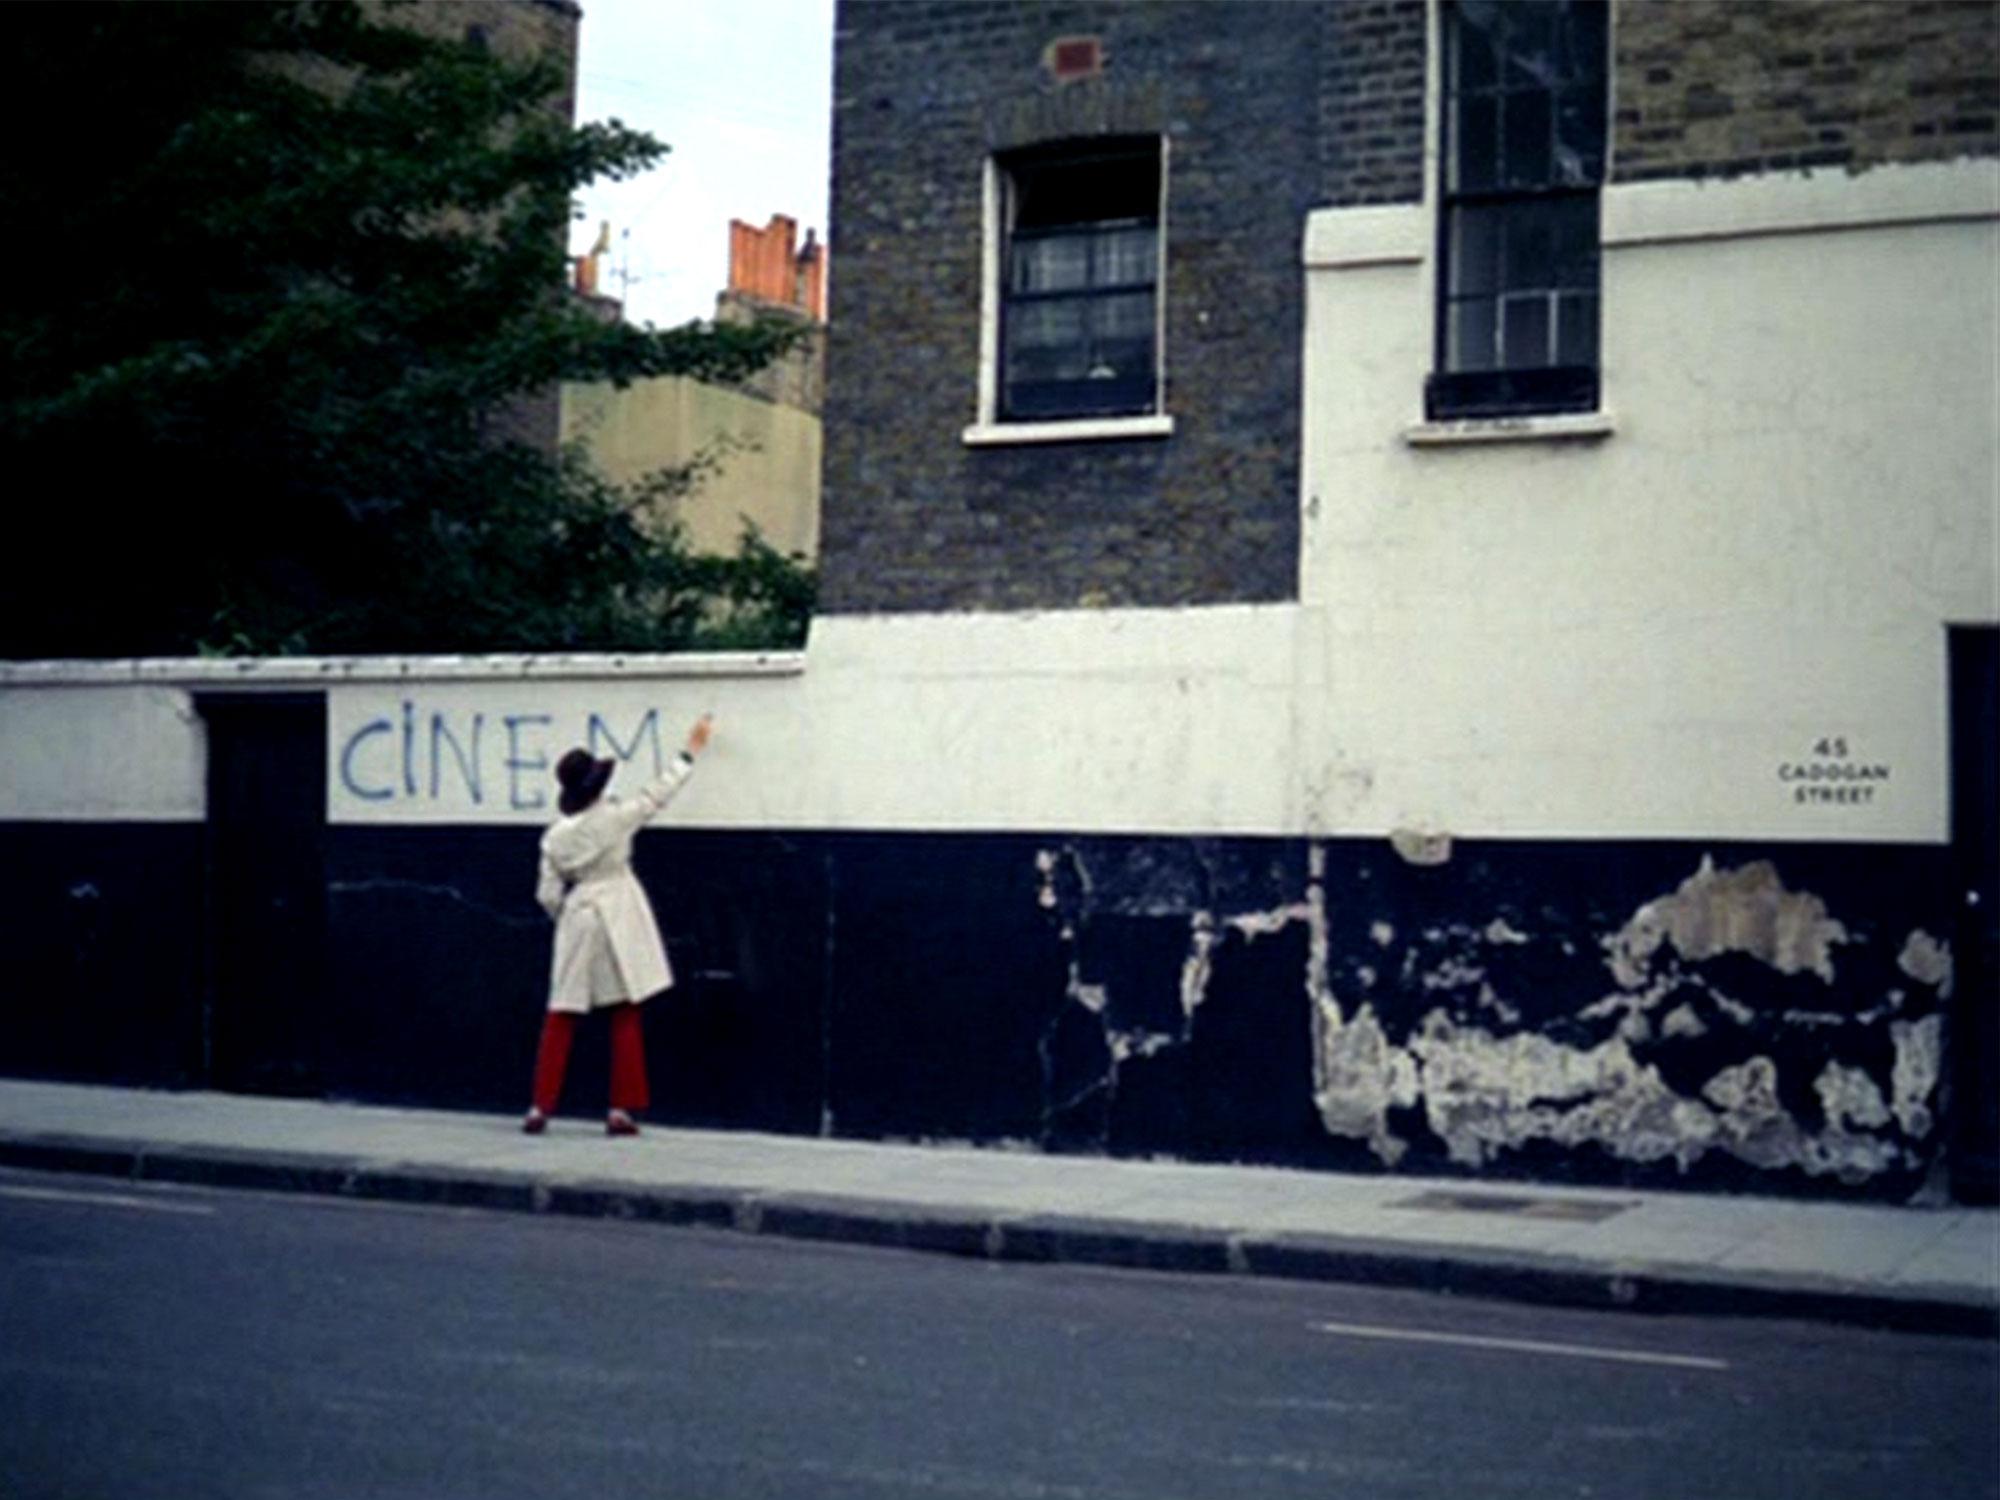 Sympathy for the Devil graffiti wall